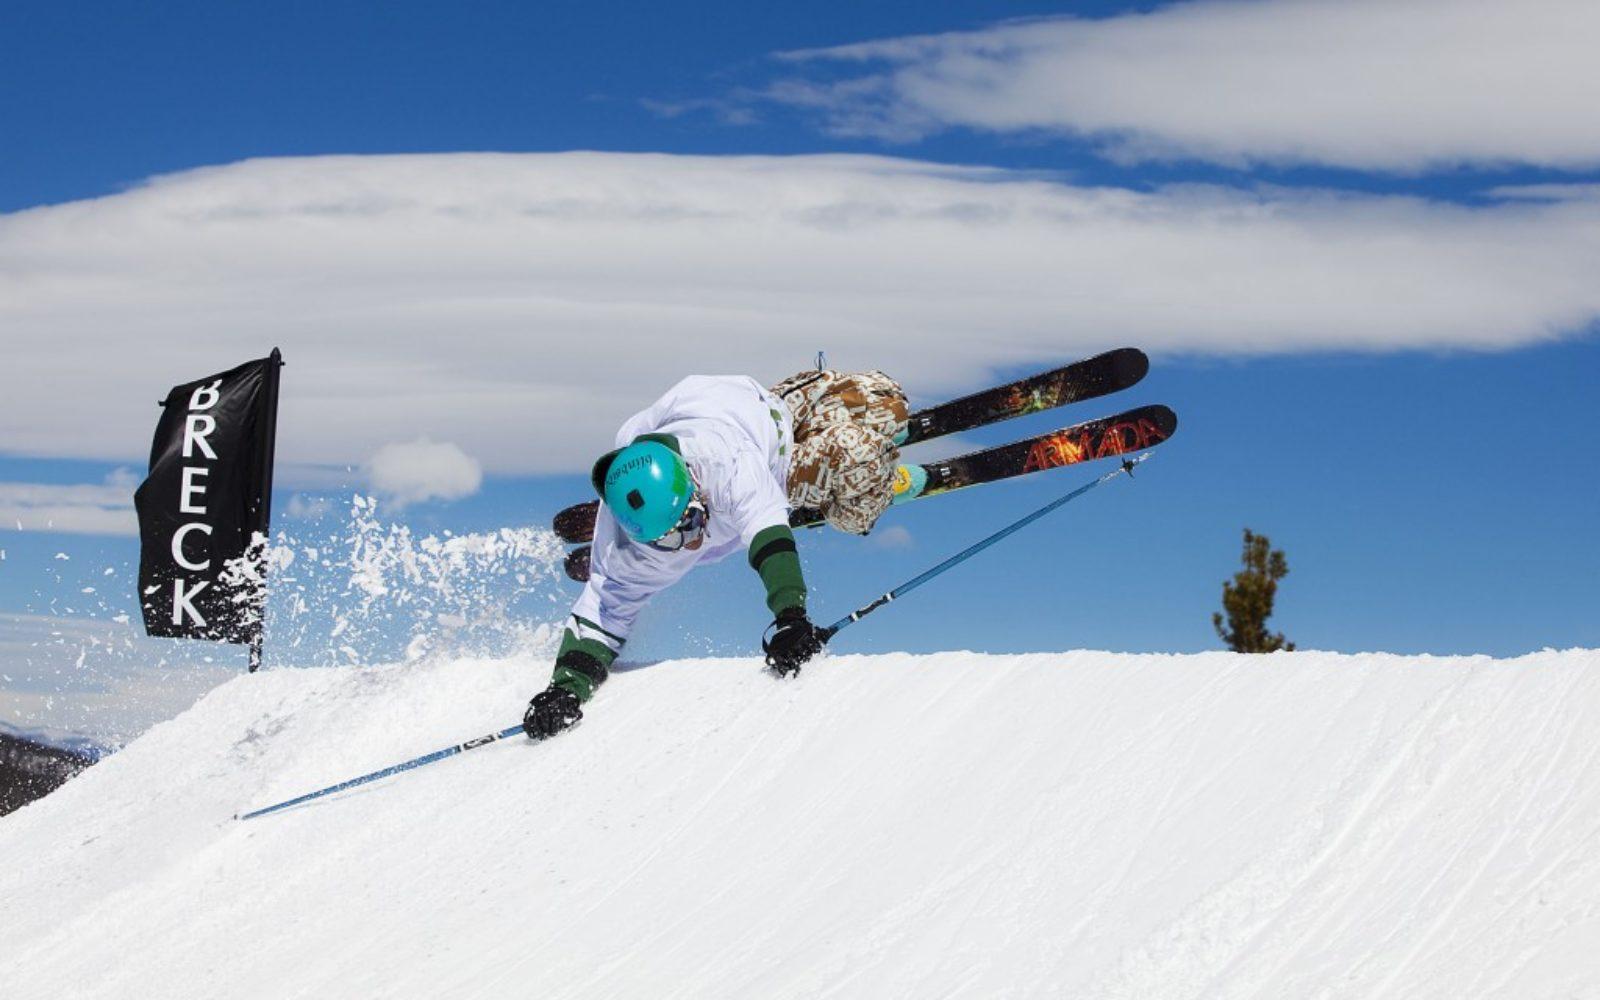 sports-xgames-skier-fun4-1024x640